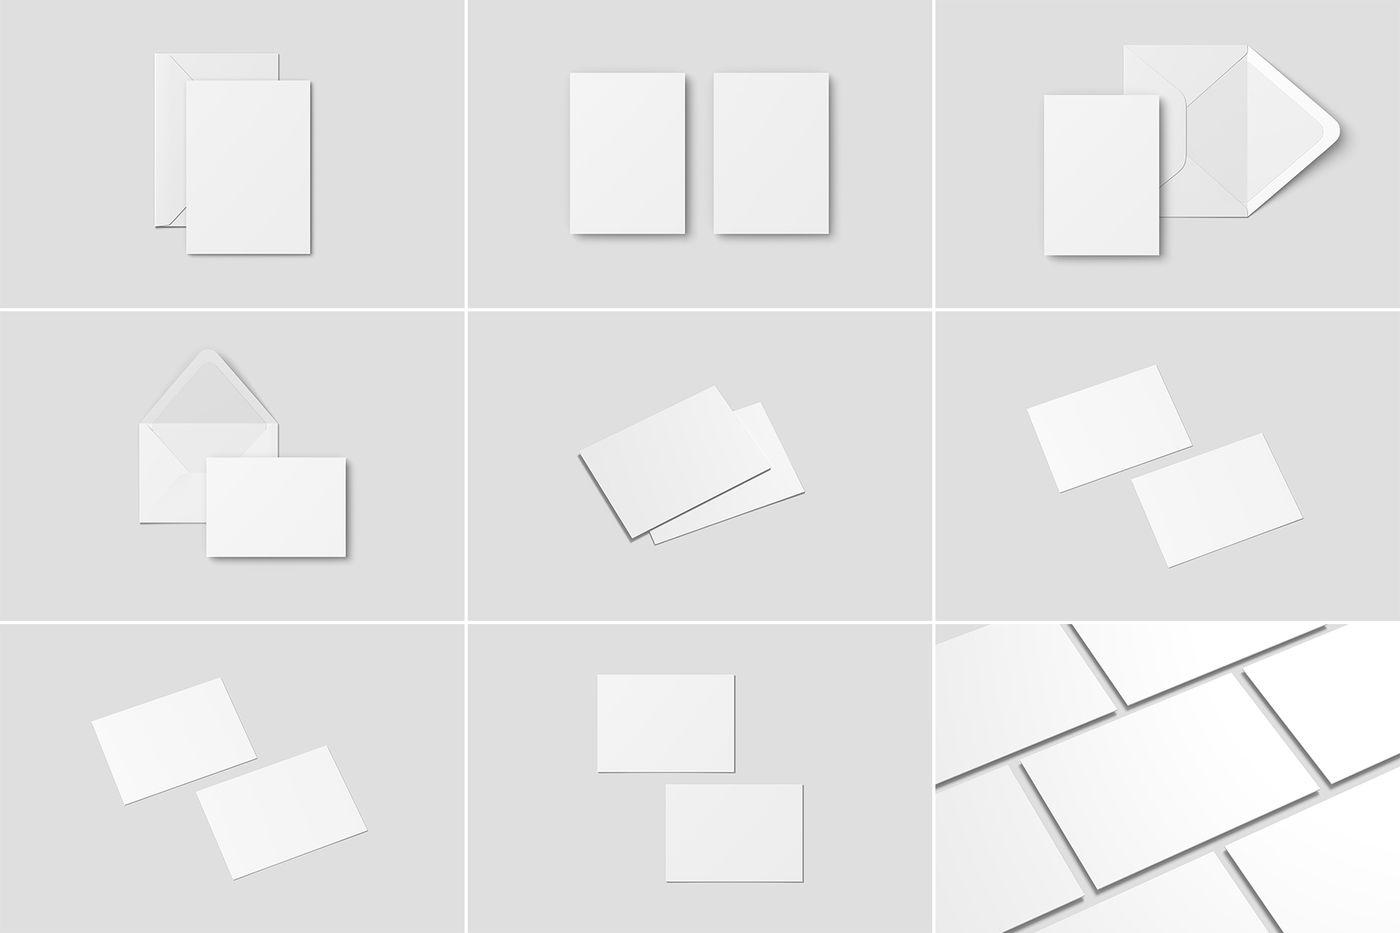 10 Envelope Psd Mockup